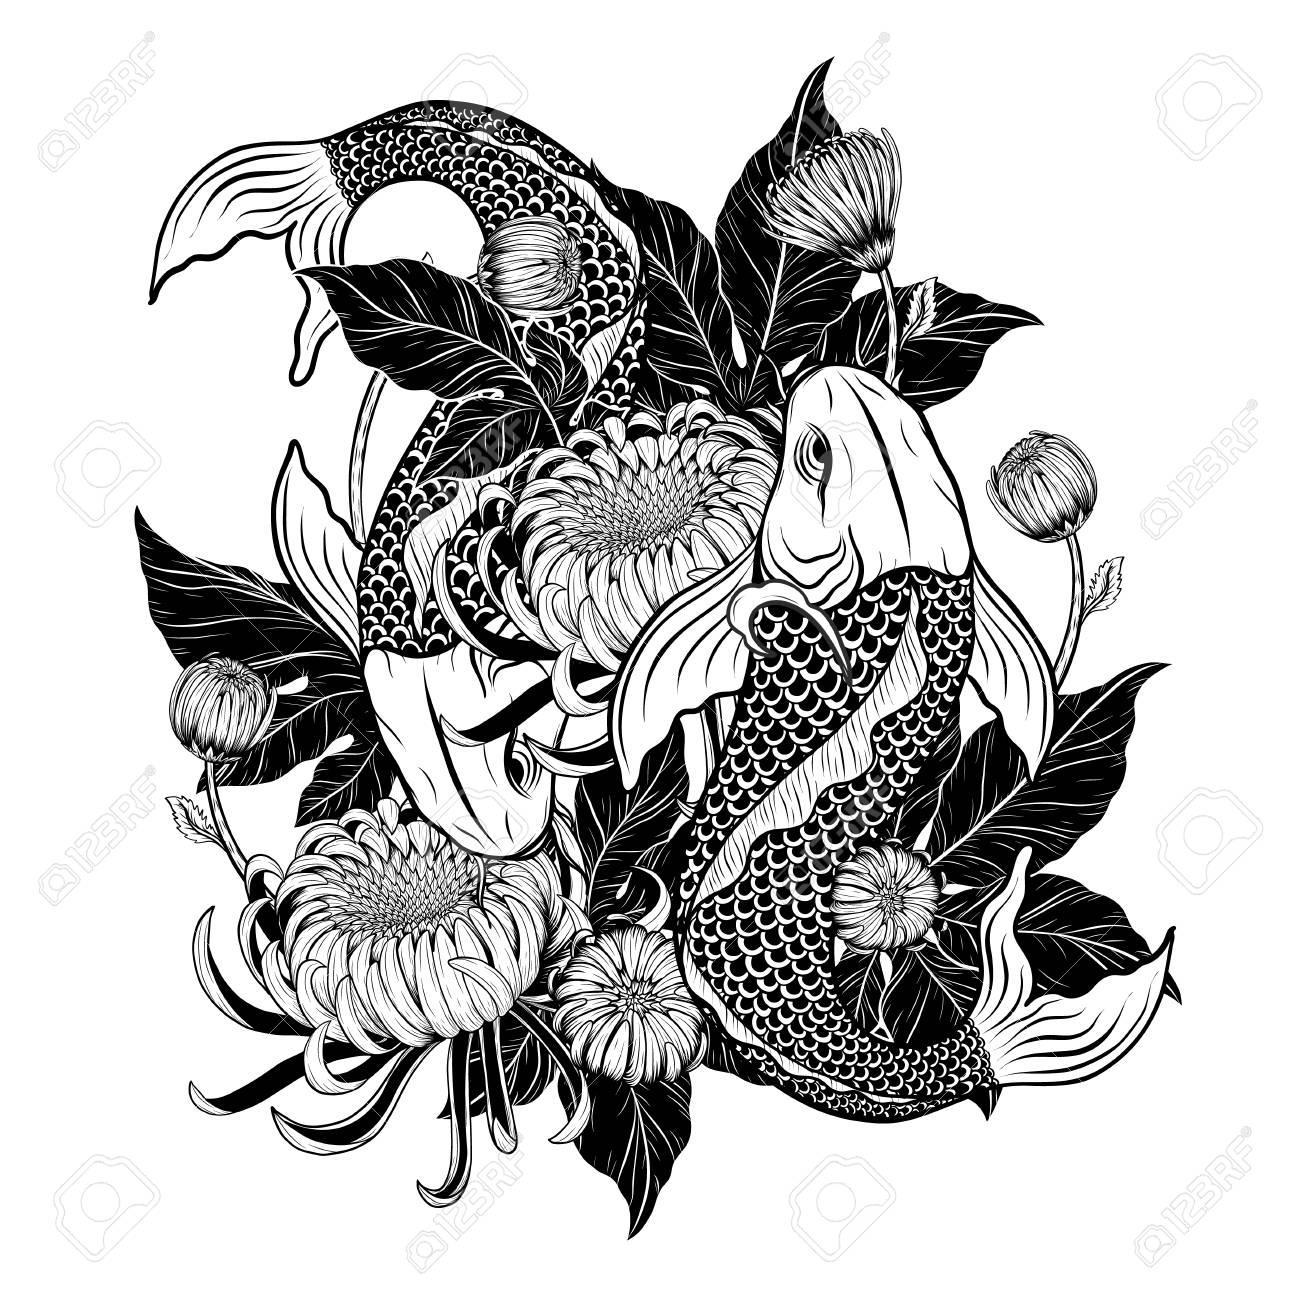 c2966c13b Koi fish and chrysanthemum tattoo by hand drawing.Tattoo art highly  detailed in line art